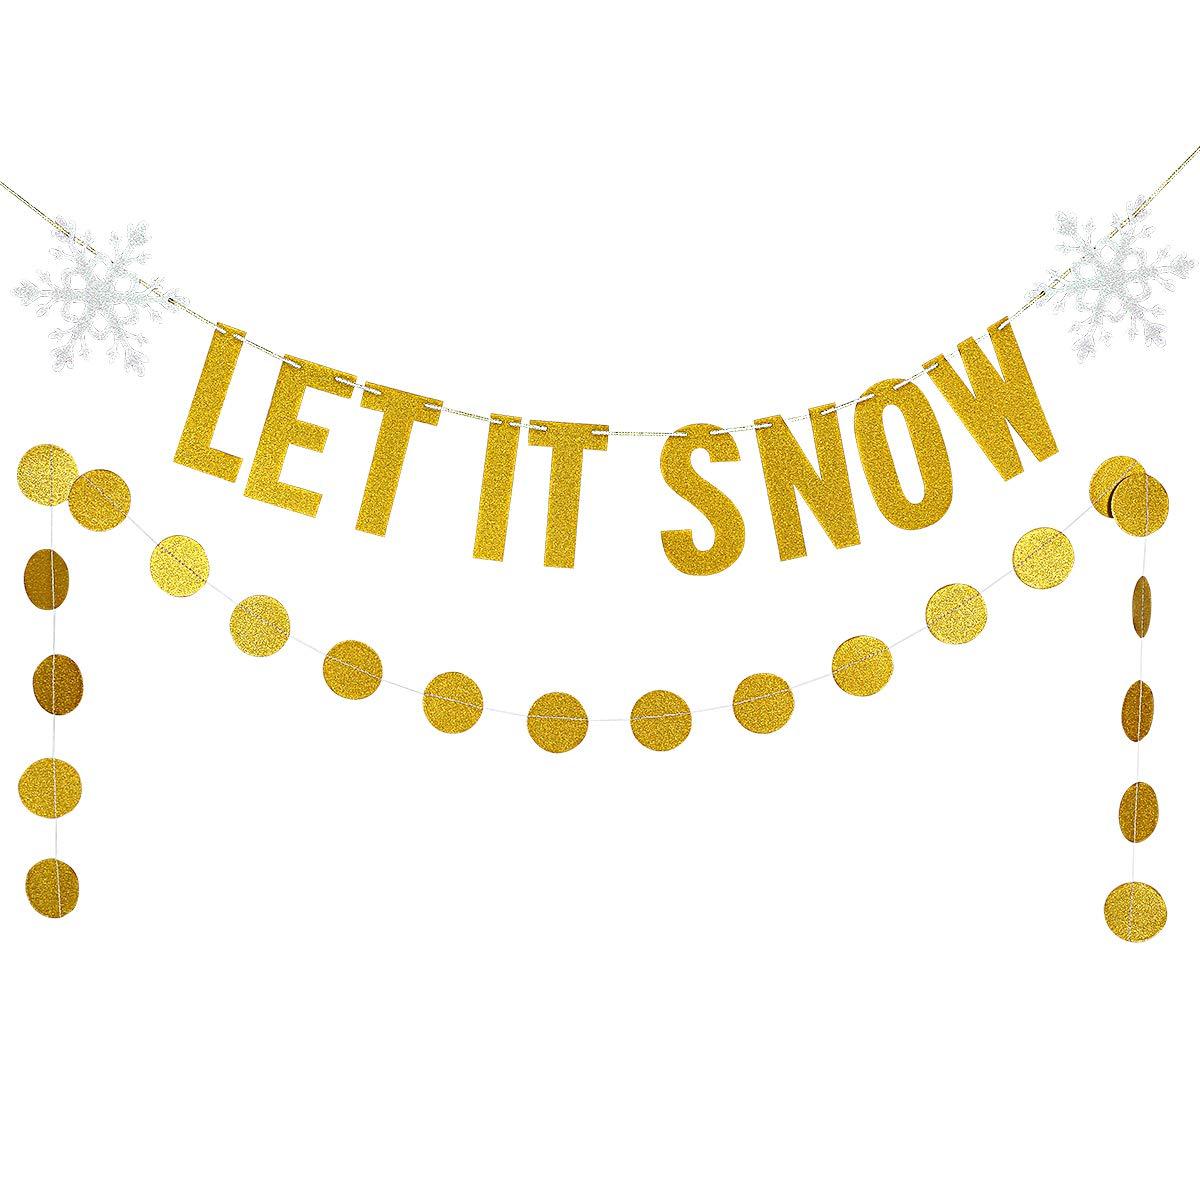 Christmas Snowflake Garland Decor Kit,Gold Glittery Let It Snow and Gold  Glittery Circle Dots Garland (25pcs Circle dot).